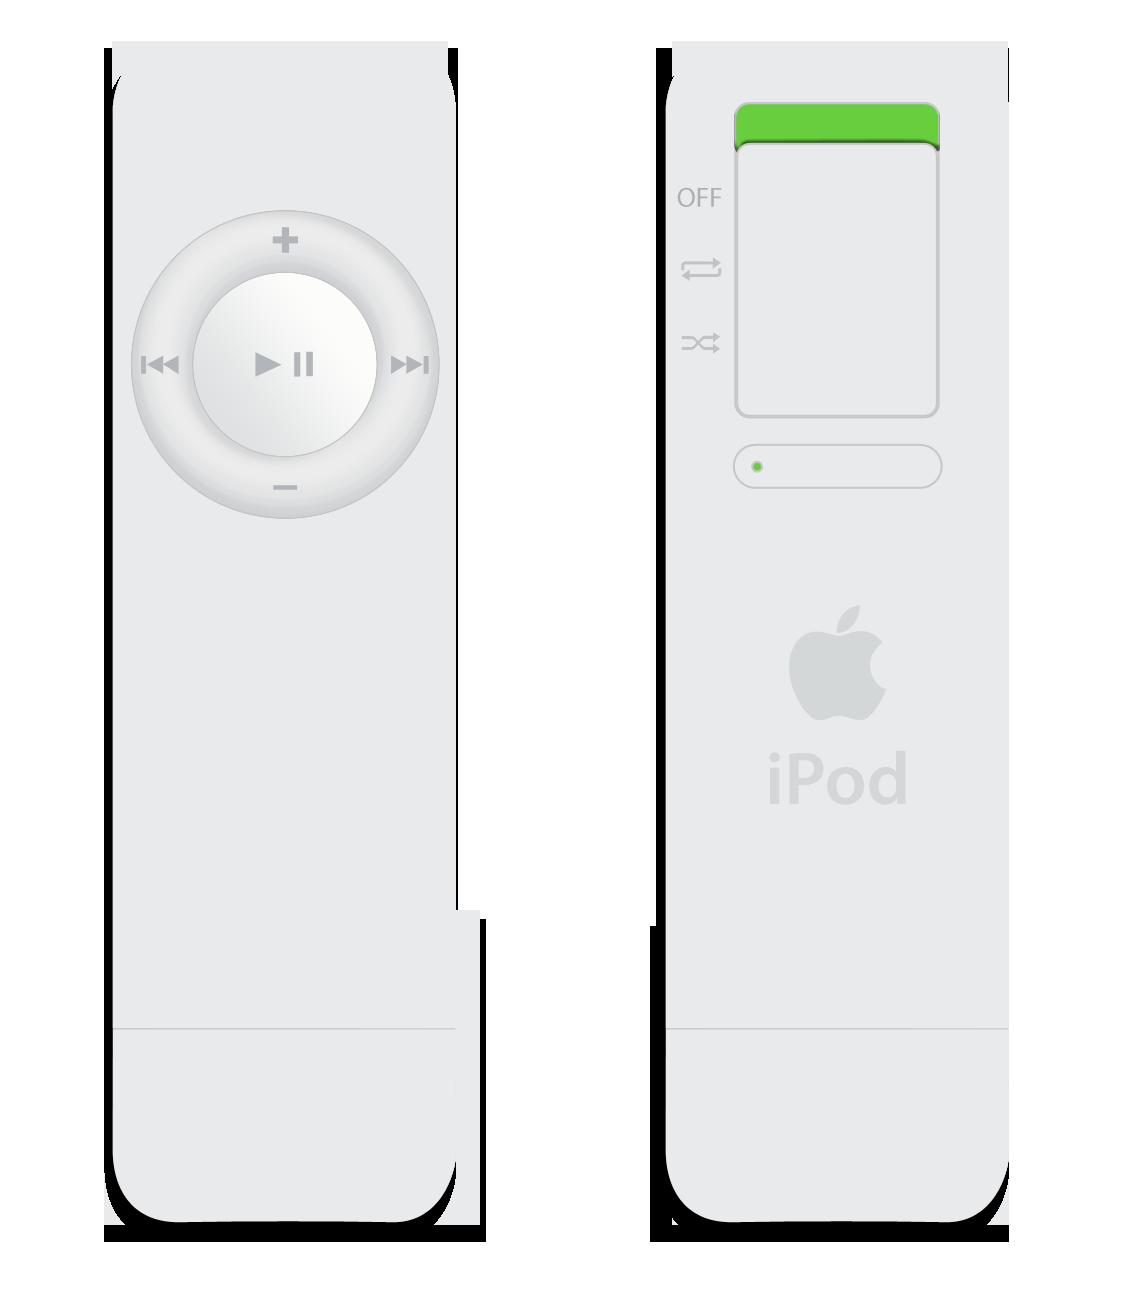 apple ipod shuffle 512mb reuse repair recycle learn rh usedpcjob co uk New iPod Shuffle Manual Apple iPod Nano Manual